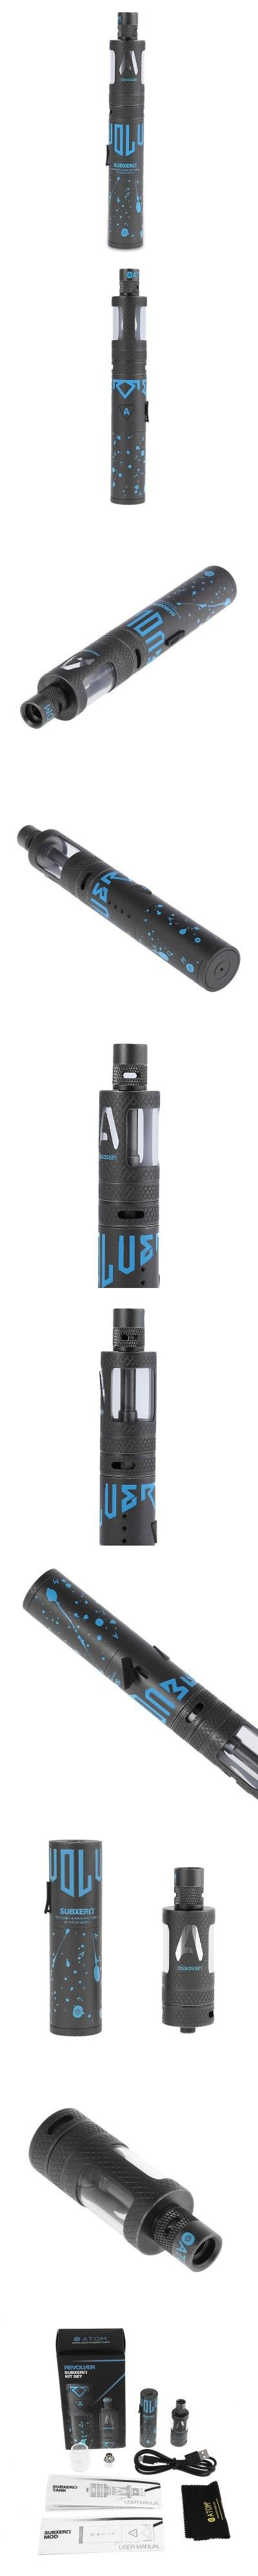 Electronic Cigarettes | AtomVapes Revolver Subxerohm E Cigarette Kit $39.45